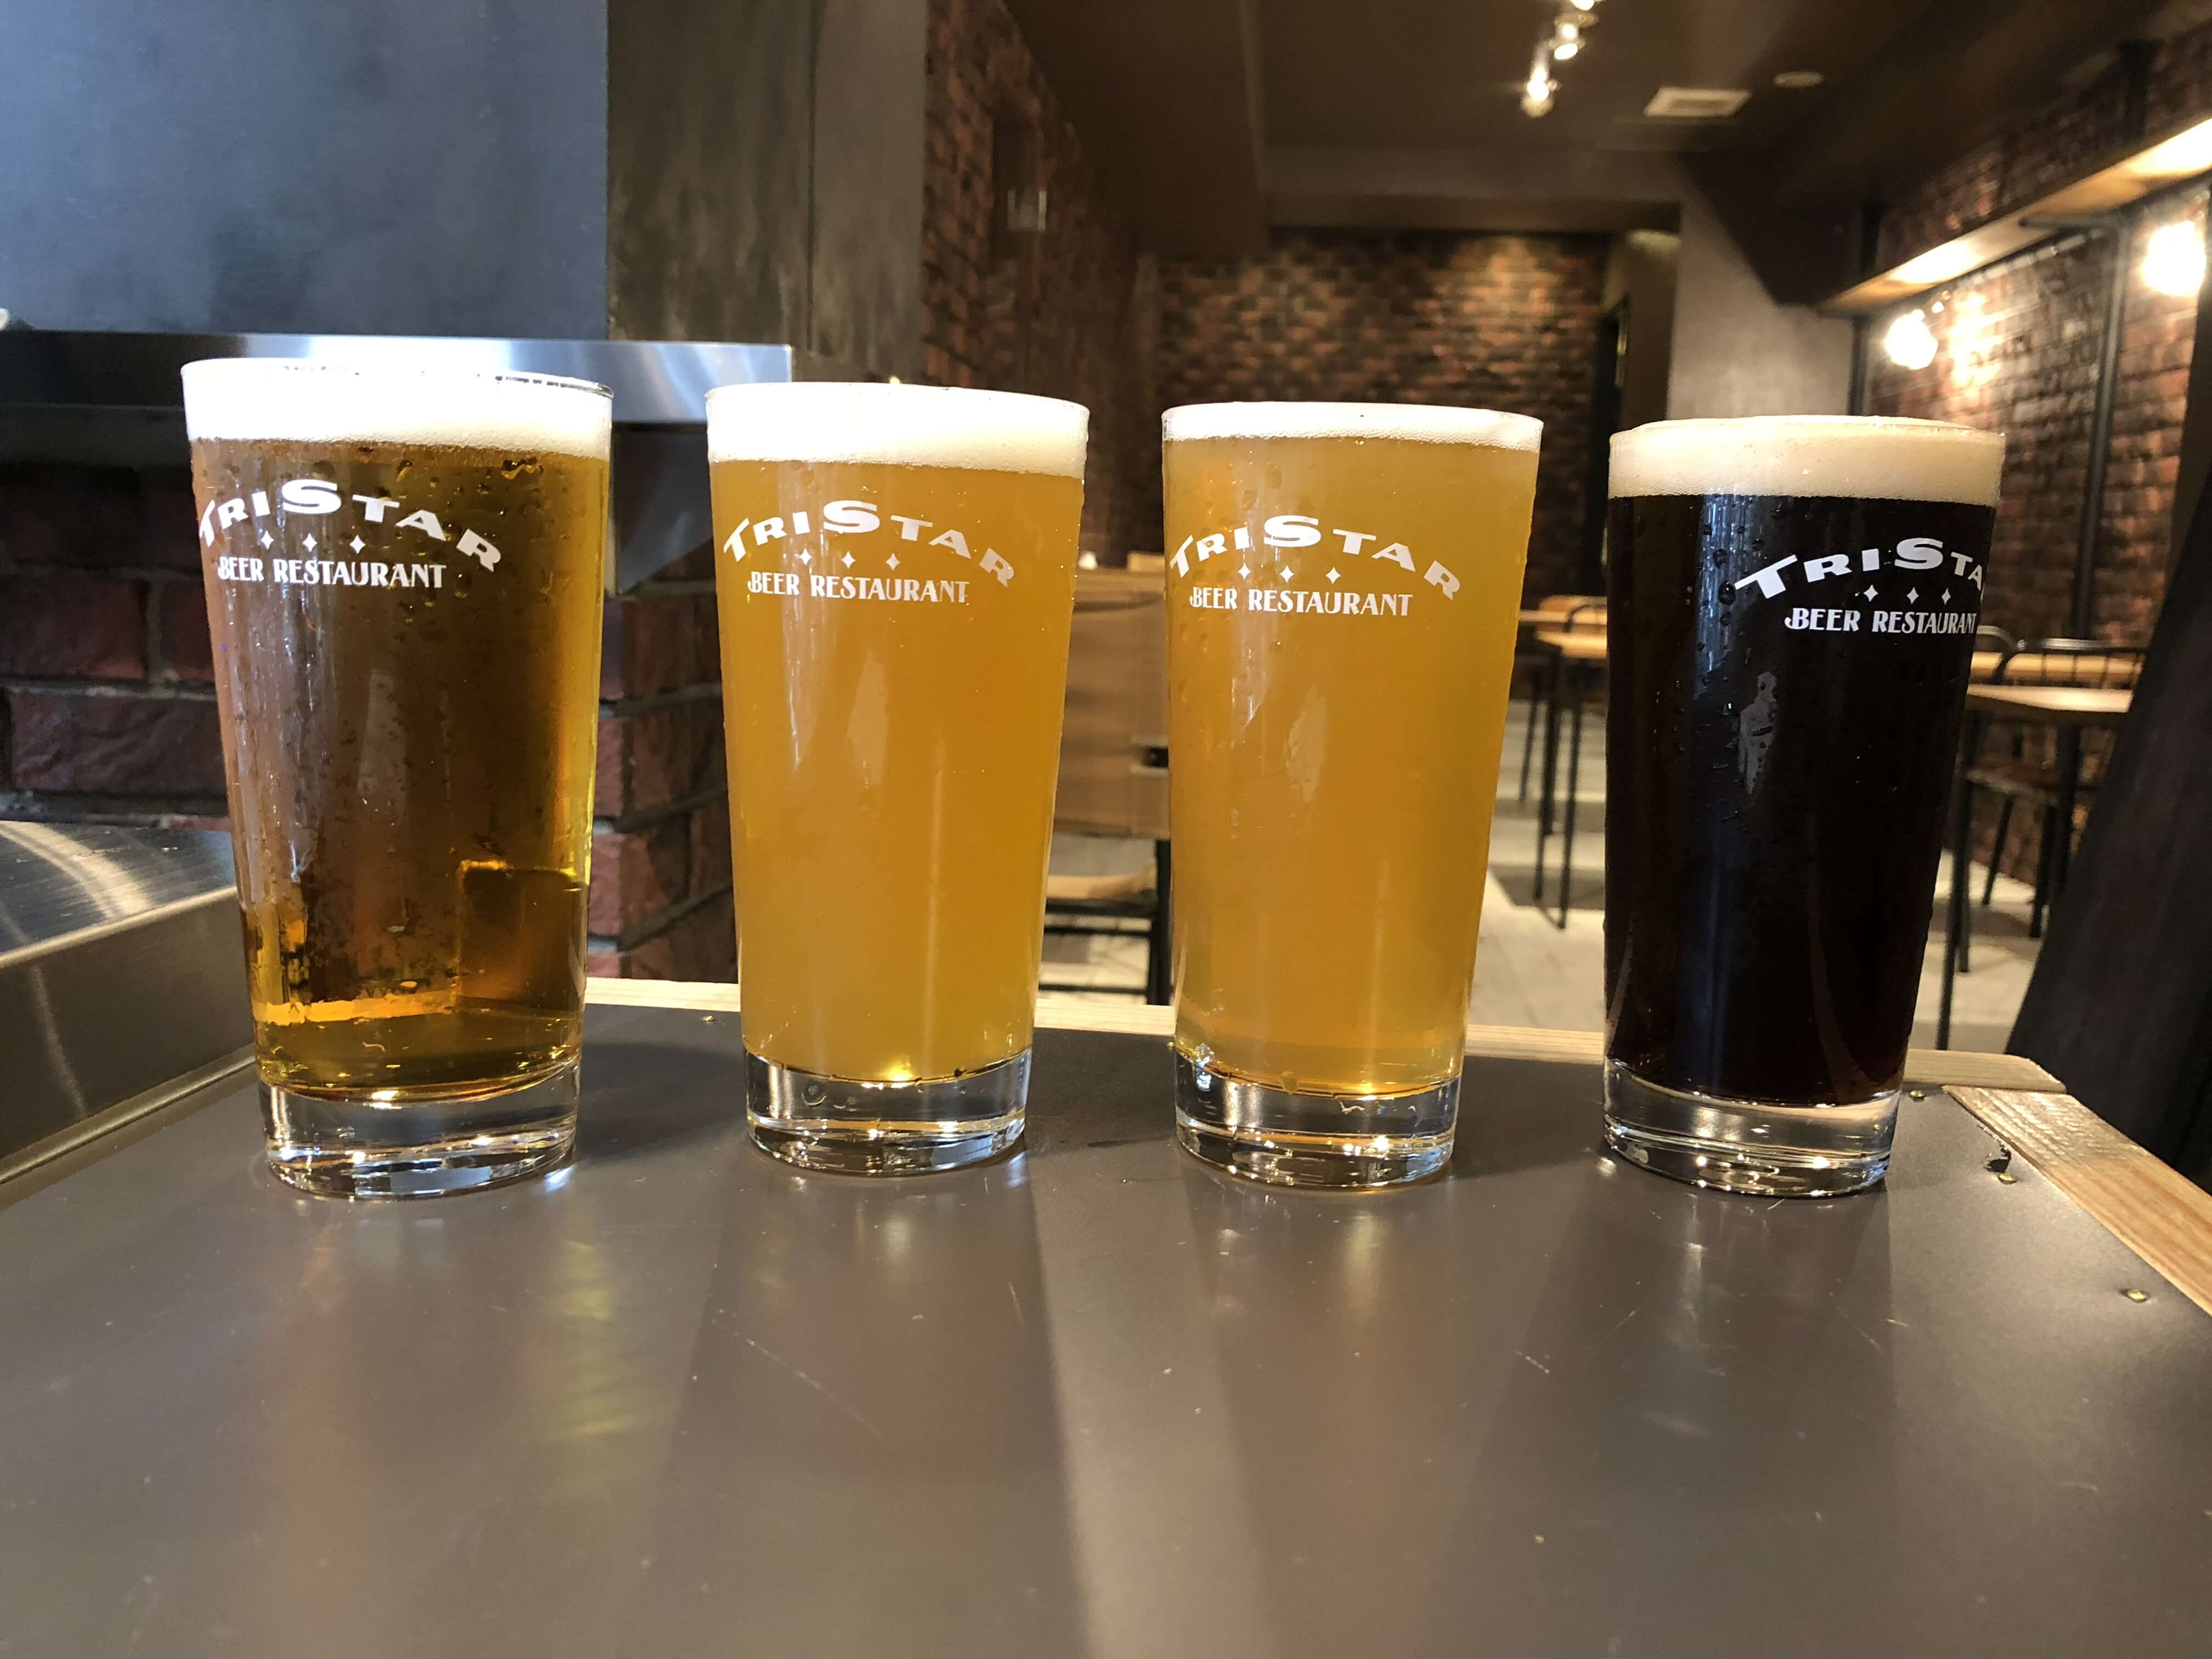 『 TRI STAR BEER RESTAURANT 』クラフトビール好きよ集まれ !! 国内海外の厳選樽生クラフトビールを10種類以上楽しめる場所